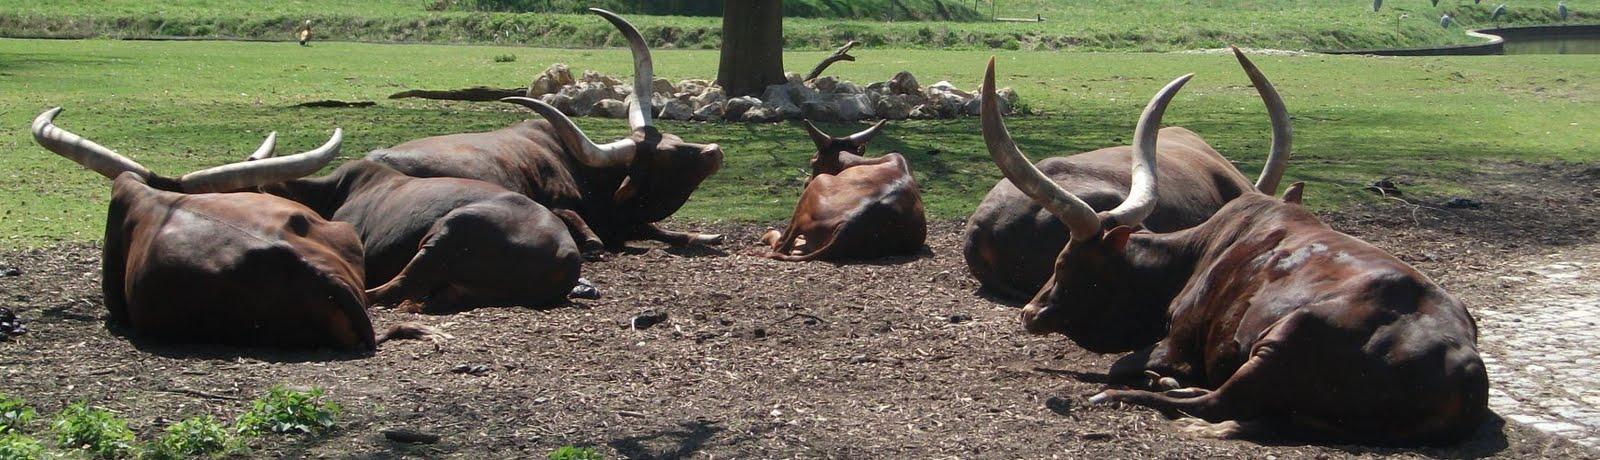 Watussirind (Zoo Augsburg)